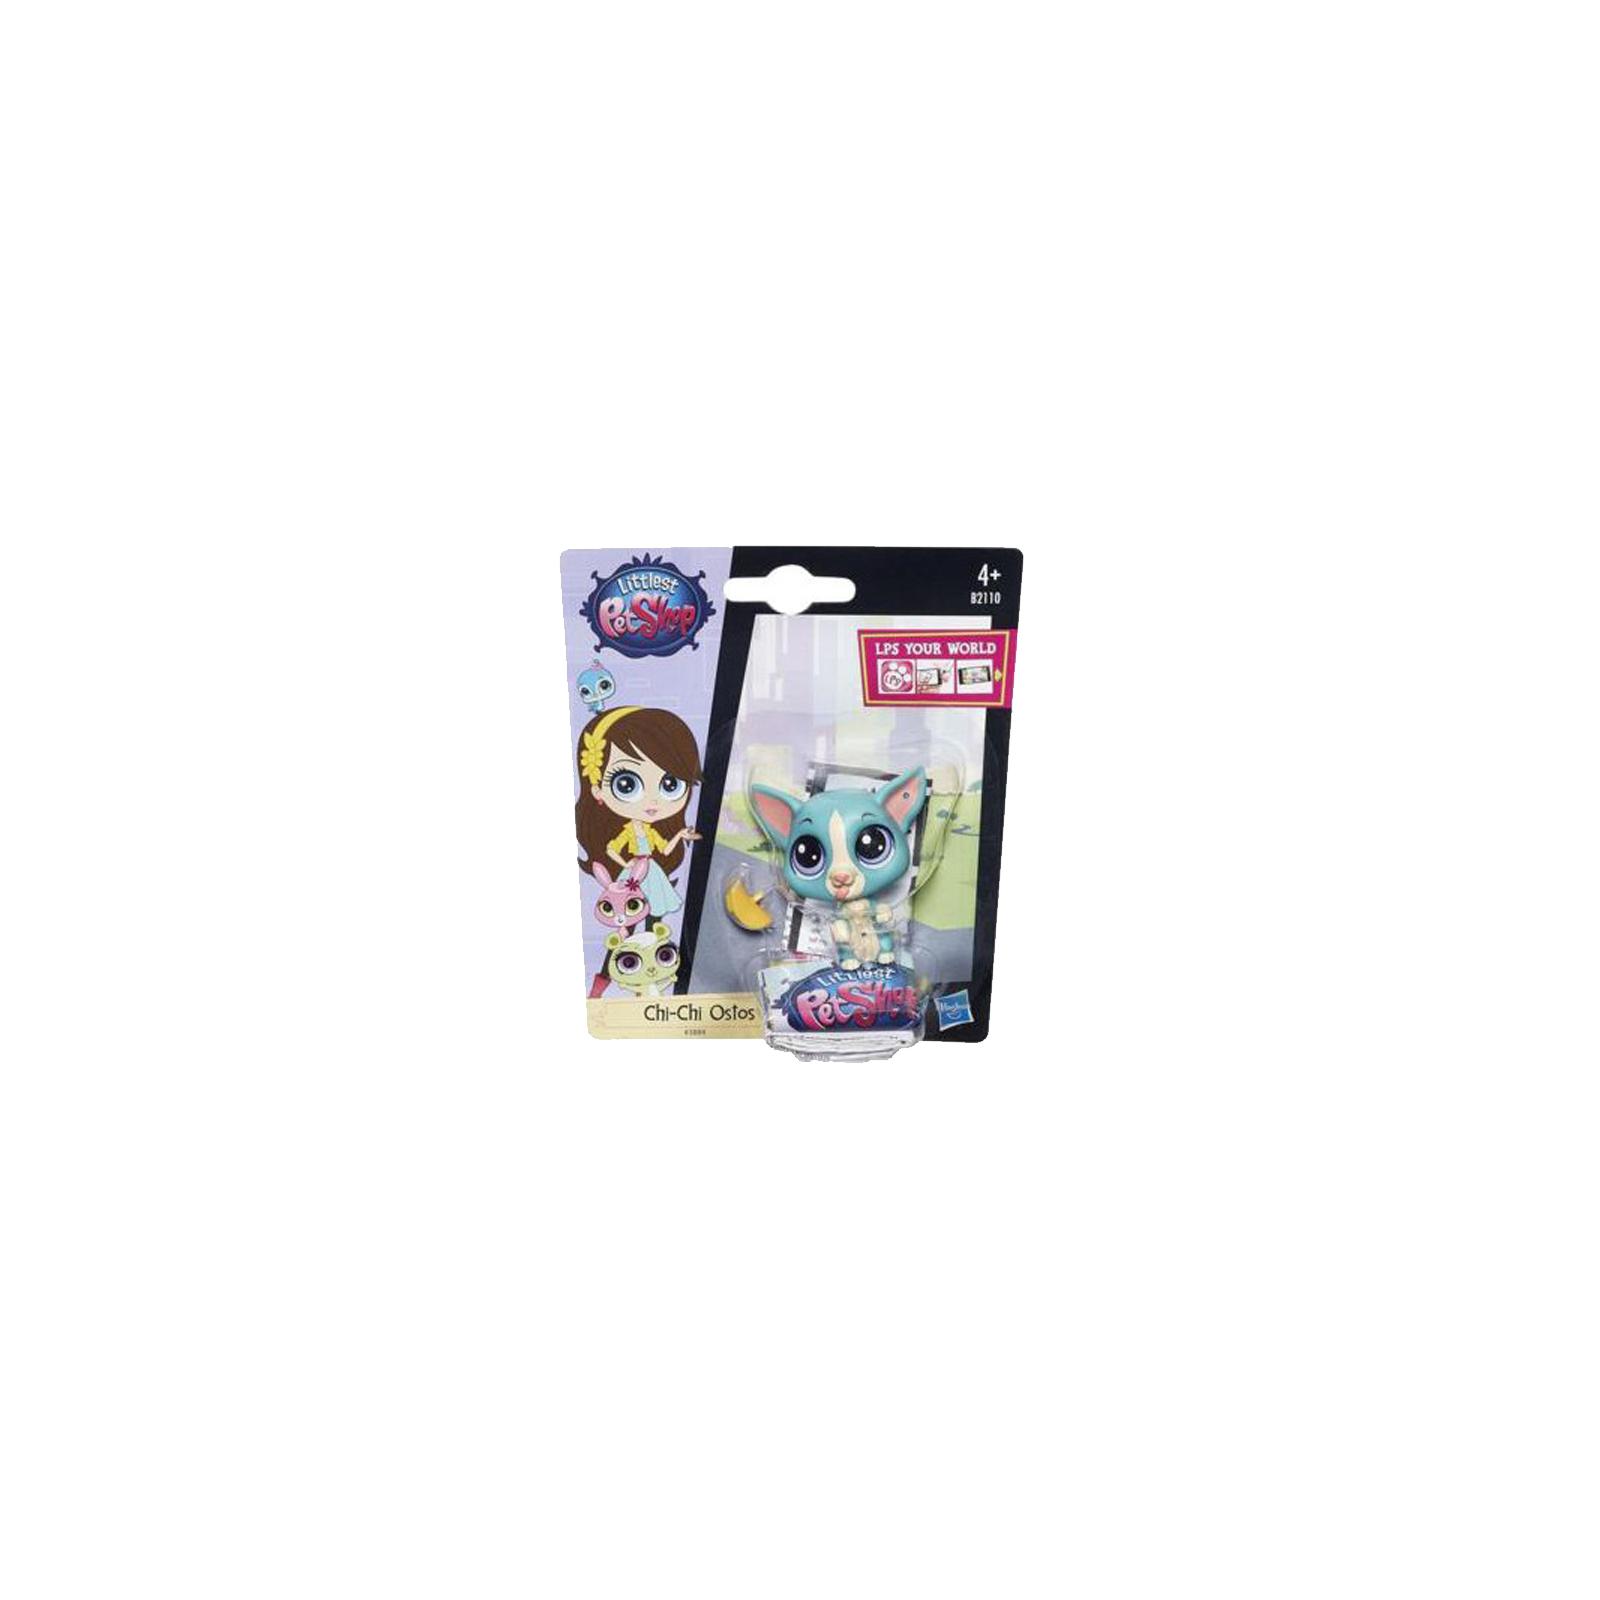 Фигурка Hasbro Зверюшка Chi-Chi Ostos (A8228-14)